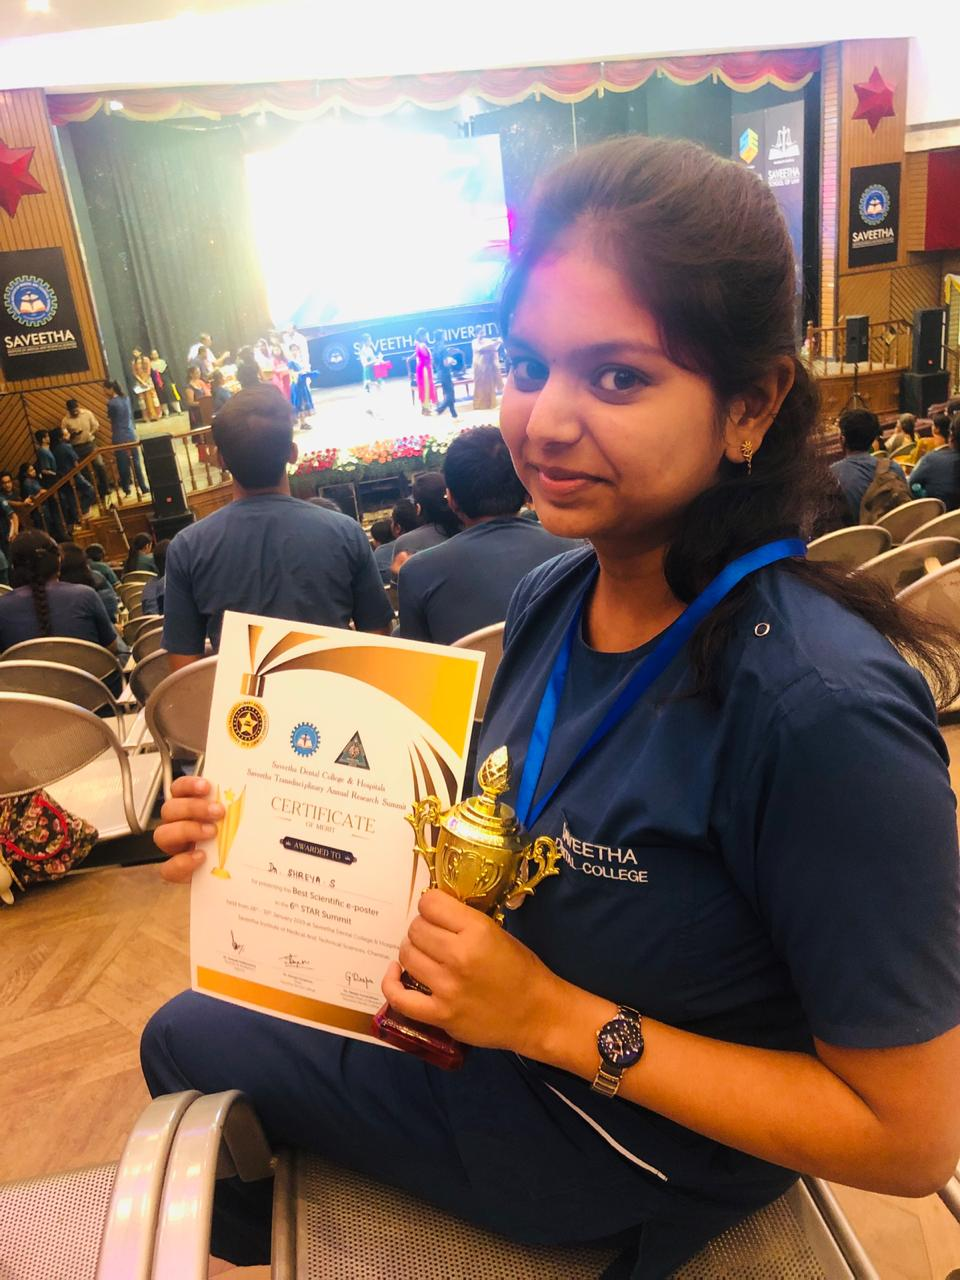 Dr. SHREYA, CRRI won the BEST RESEARCH AWARD in STAR SUMMIT 2019